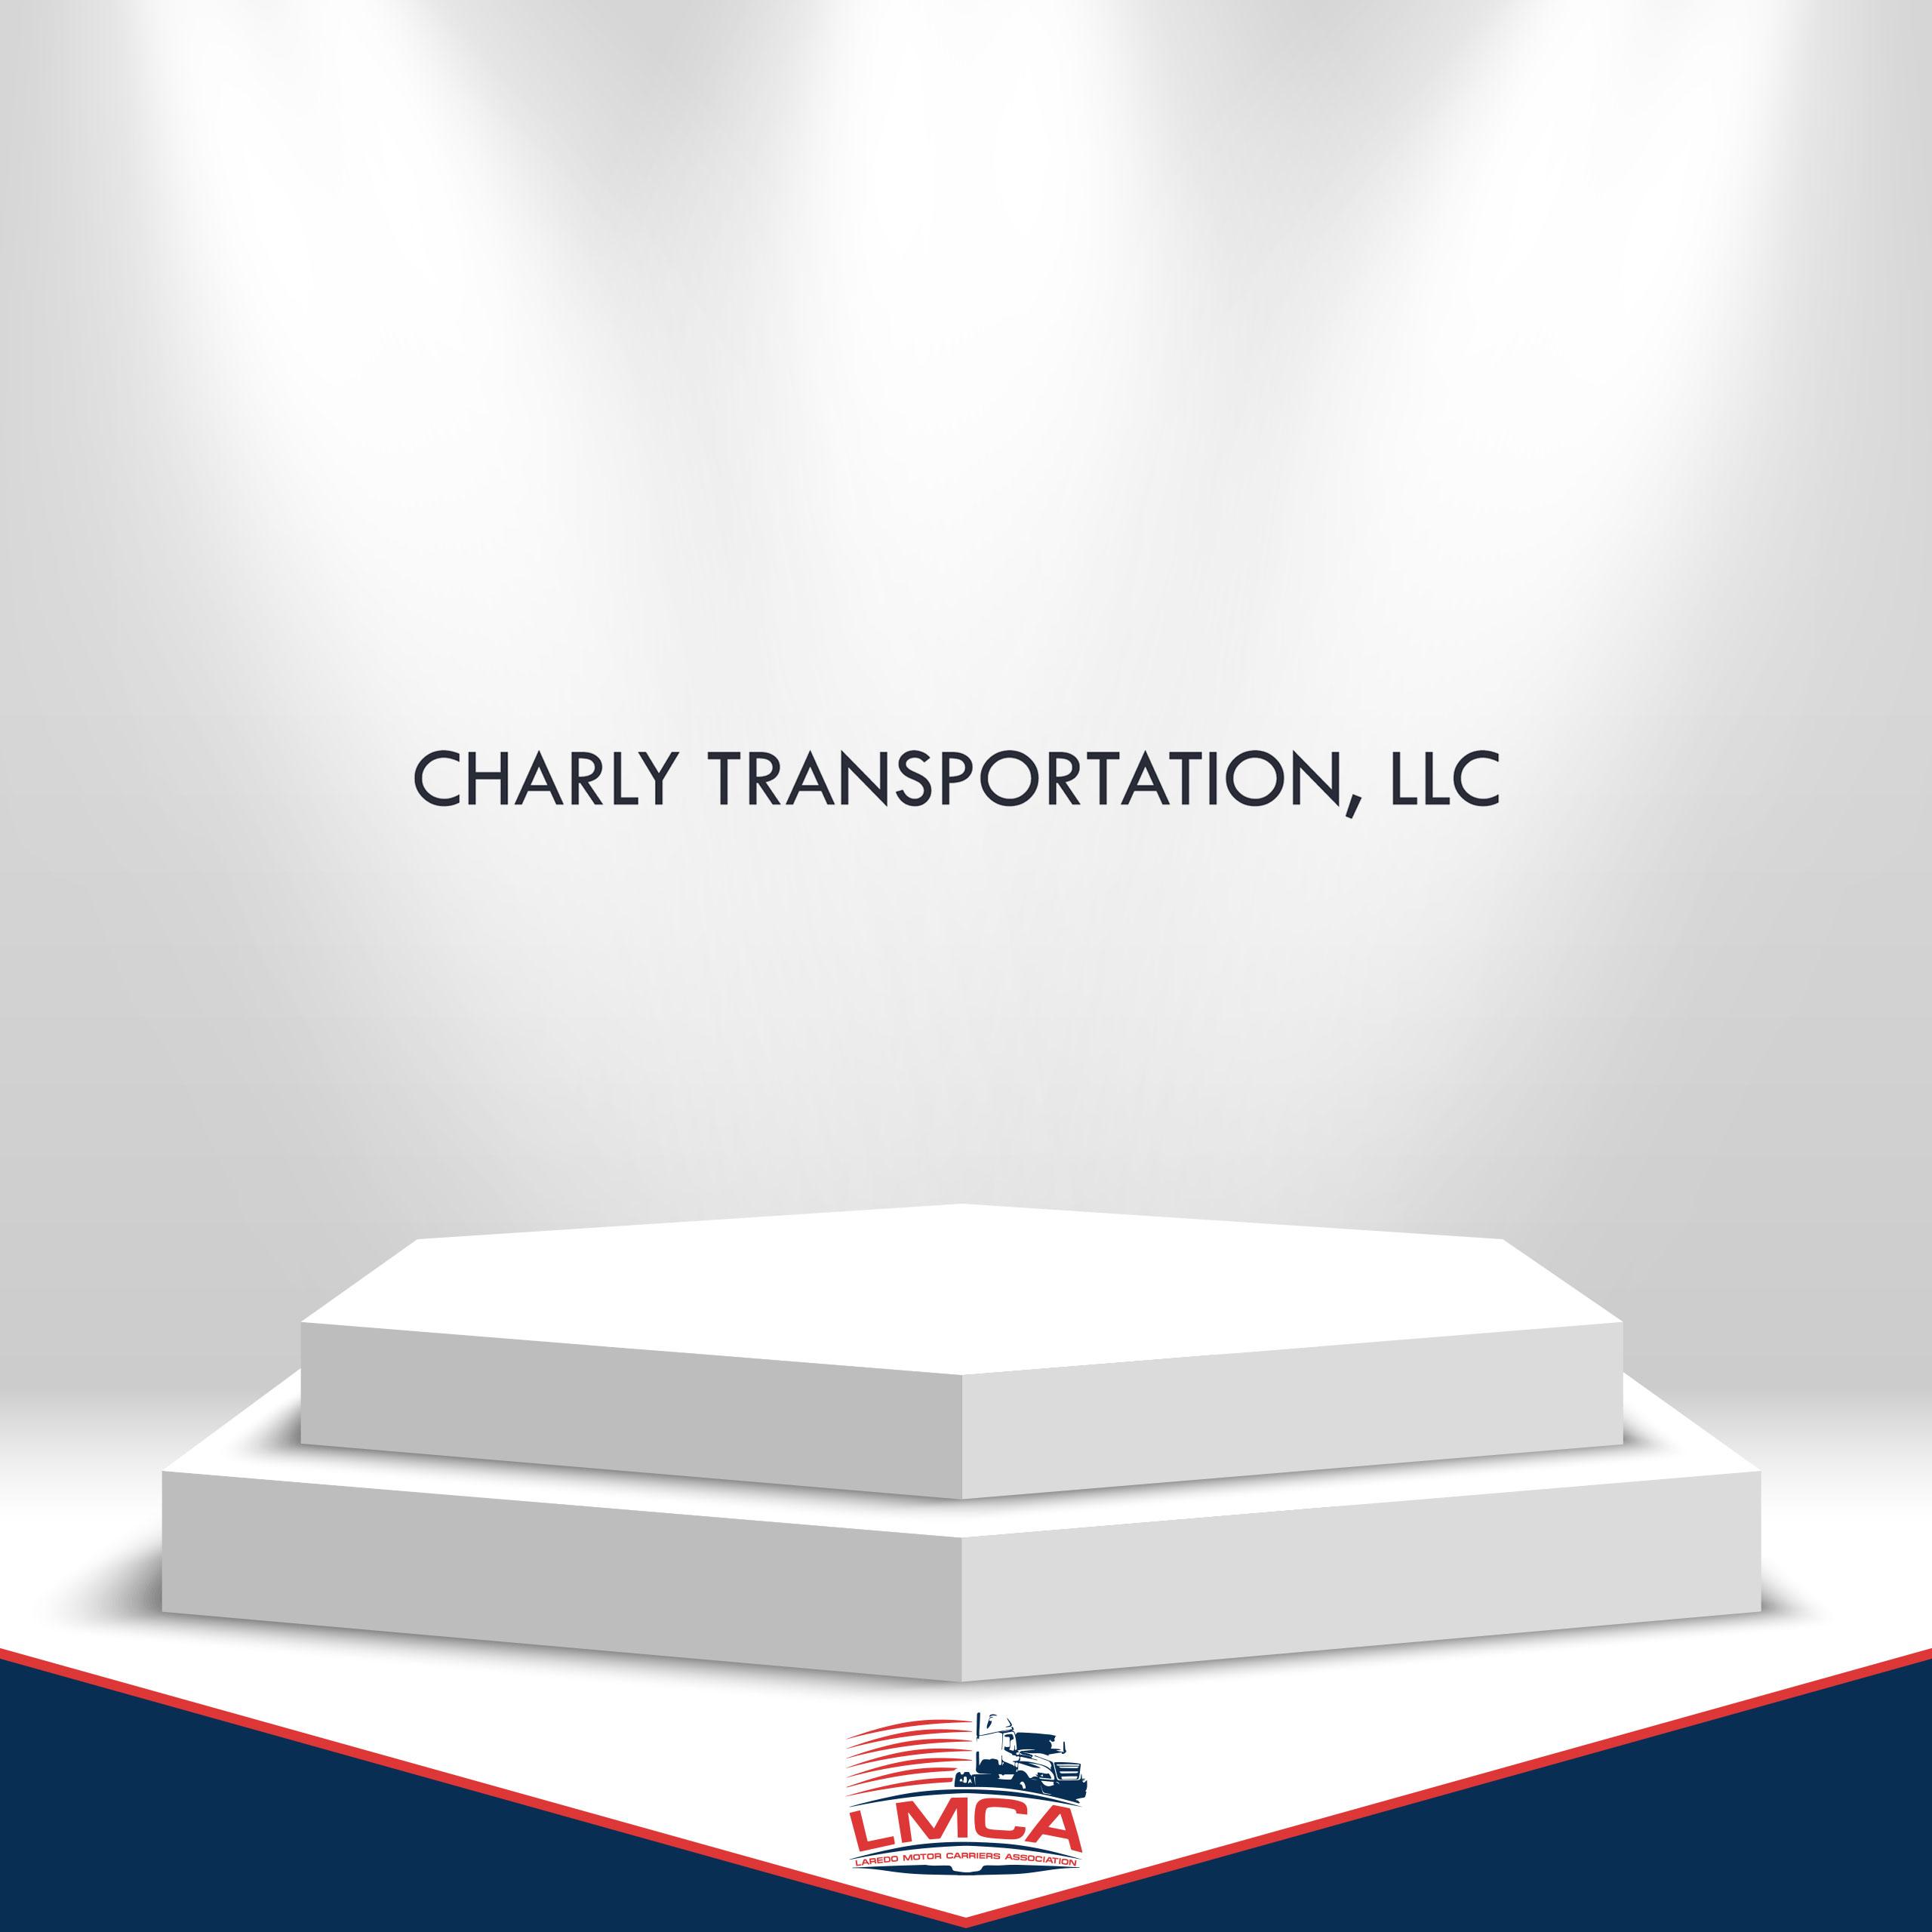 charly transport